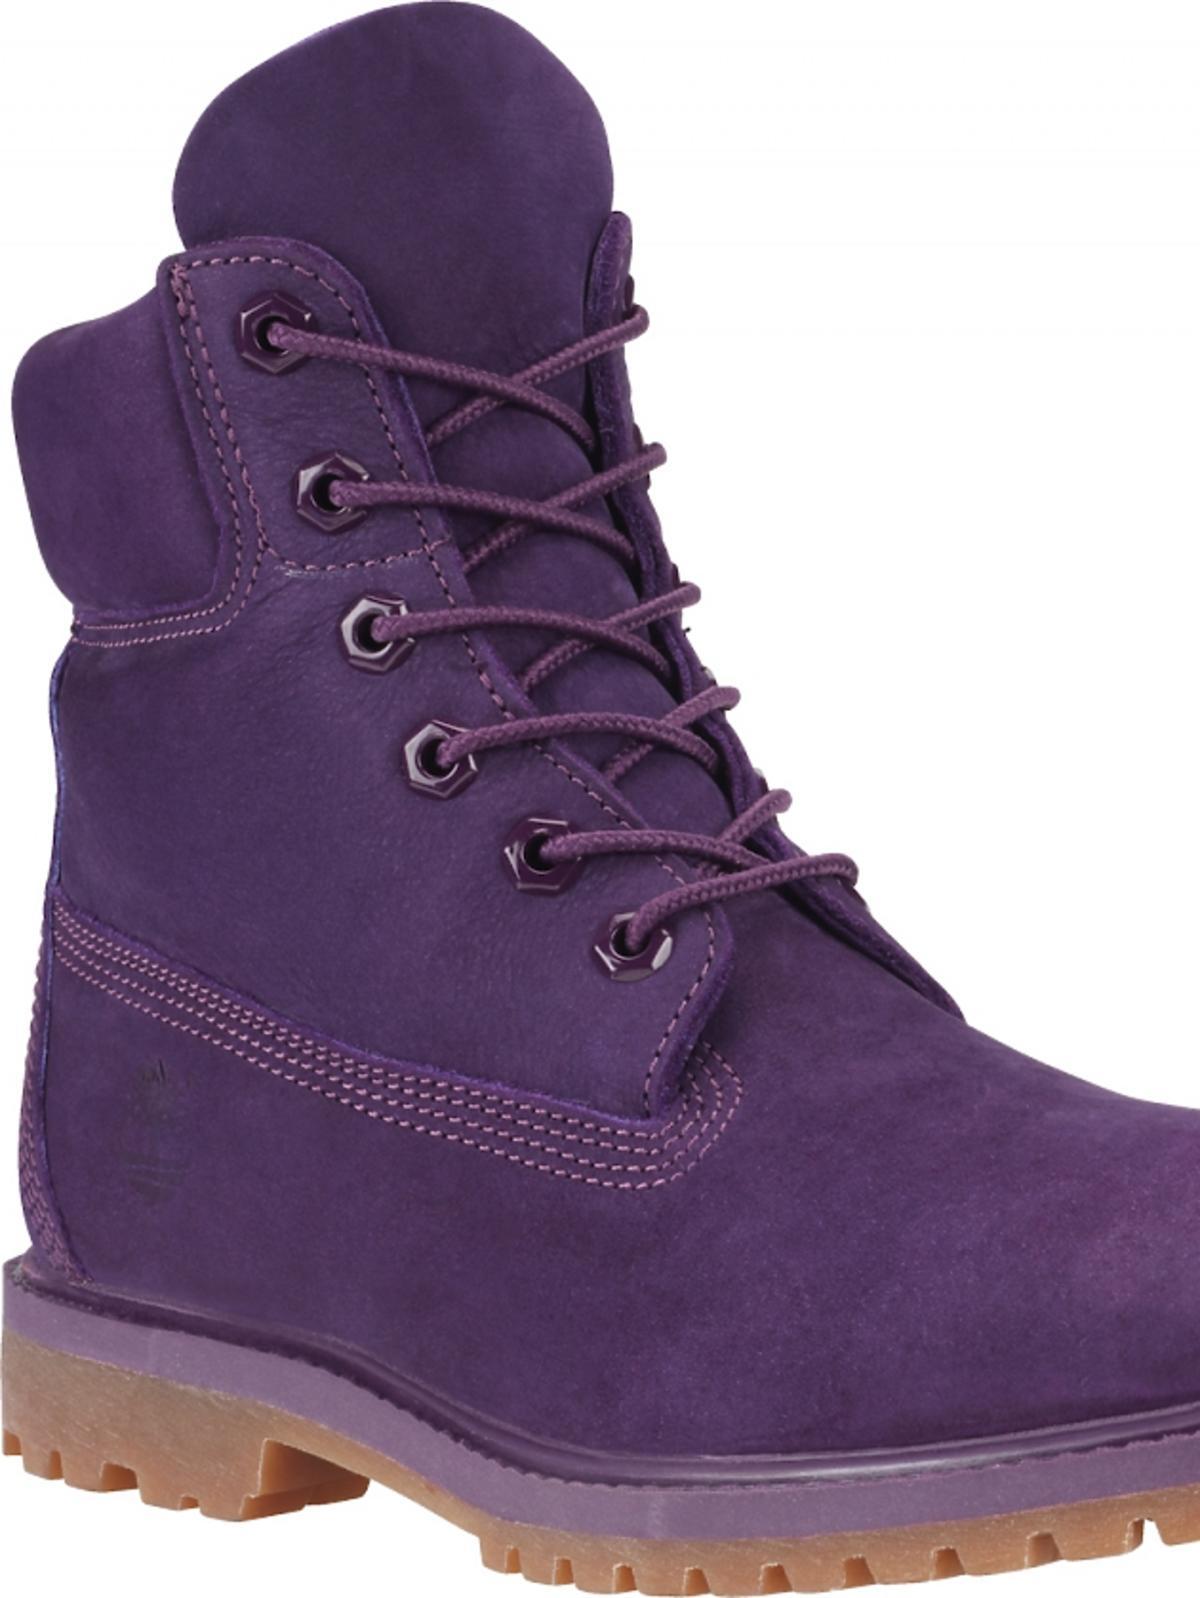 buty trapery w kolorze fioletowym